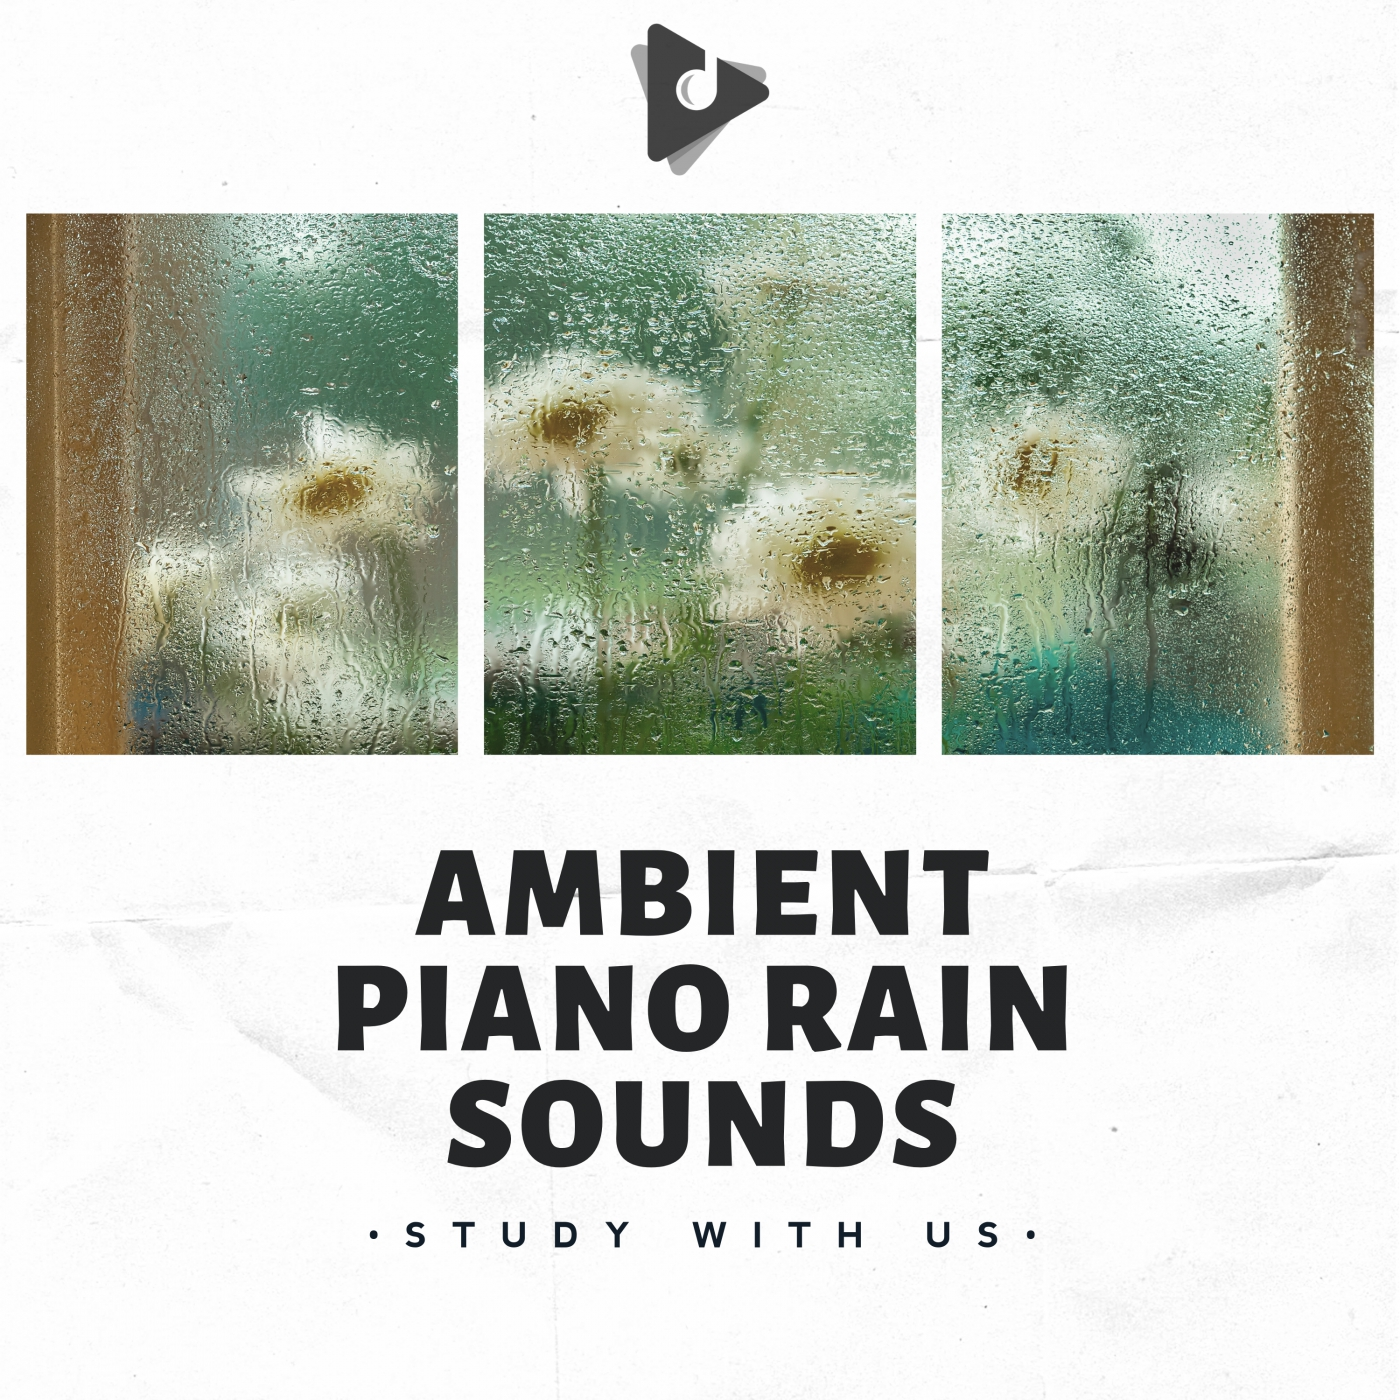 Ambient Piano Rain Sounds